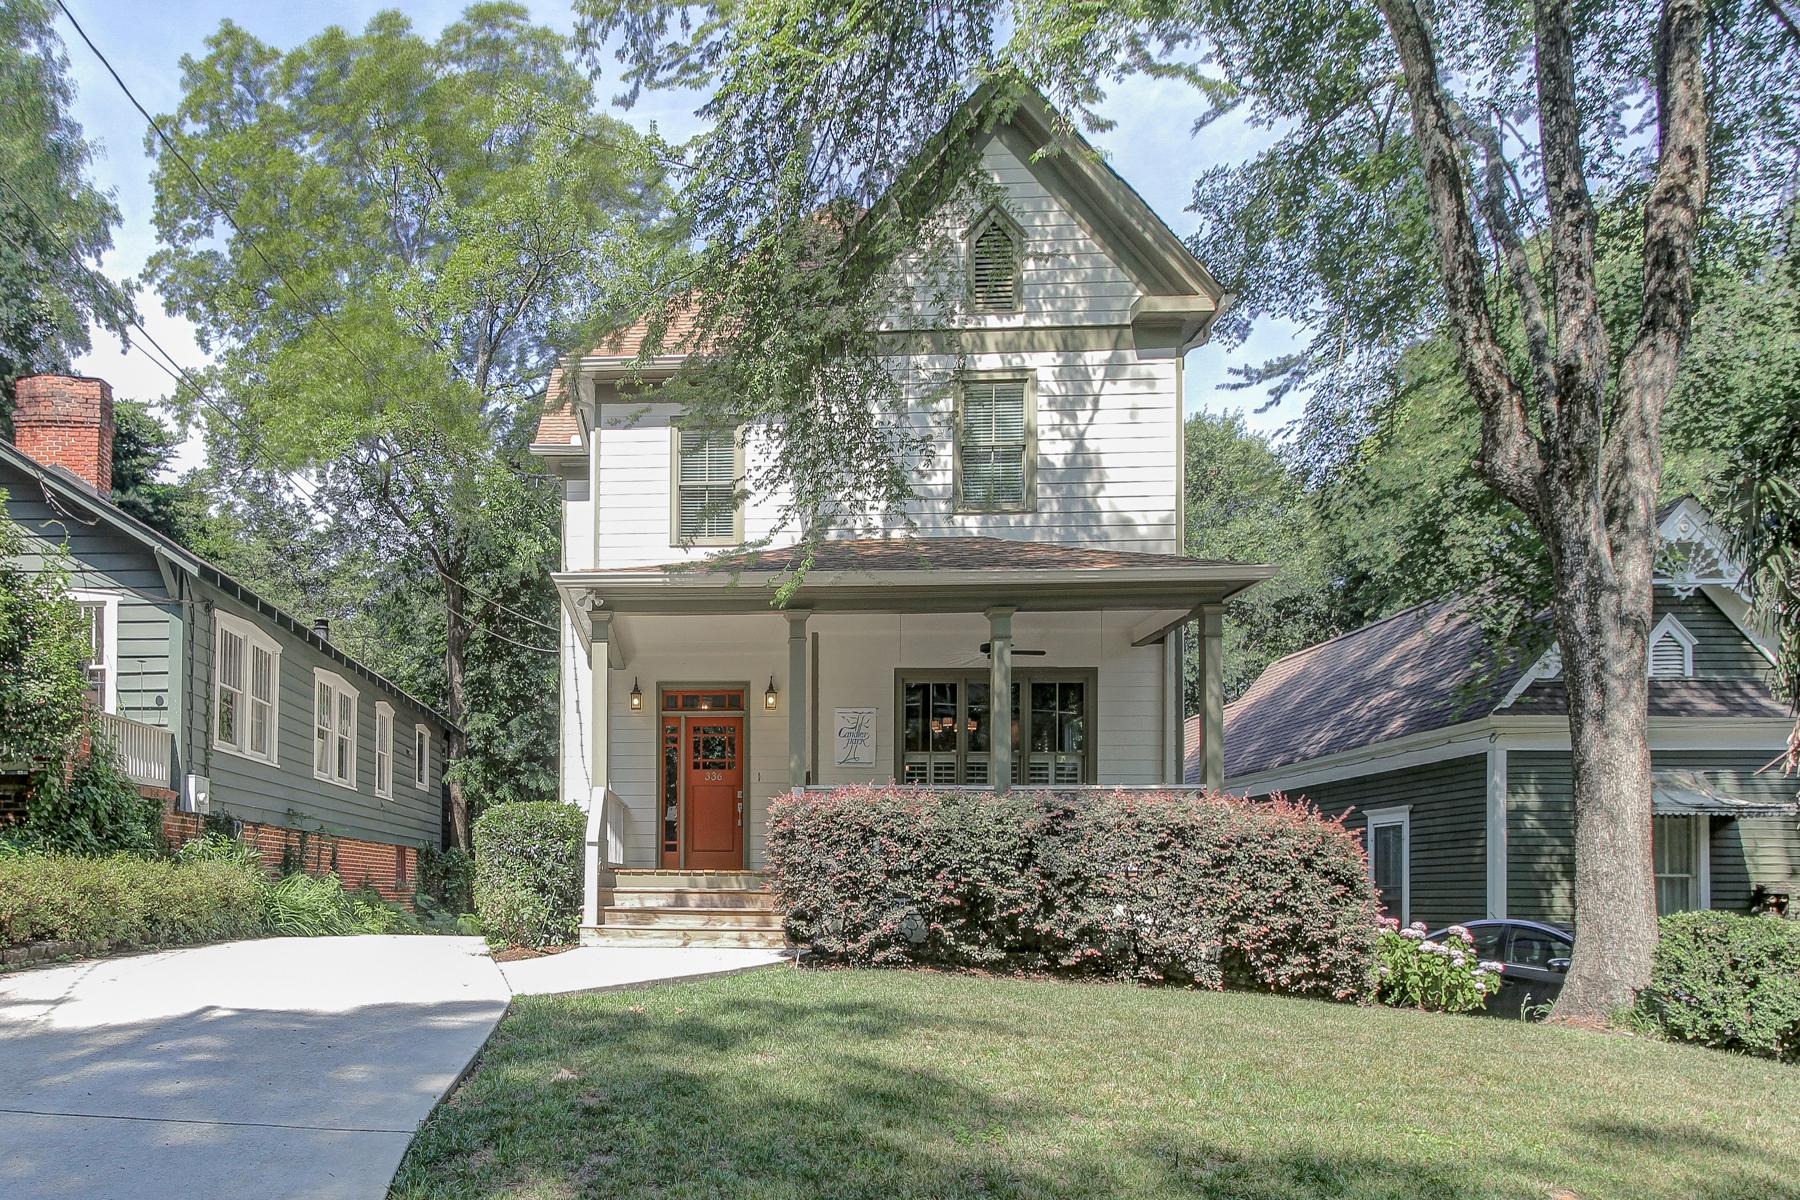 Частный односемейный дом для того Продажа на Historic Inspired Home With Modern Amenities 336 Candler Park Drive NE Candler Park, Atlanta, Джорджия, 30307 Соединенные Штаты